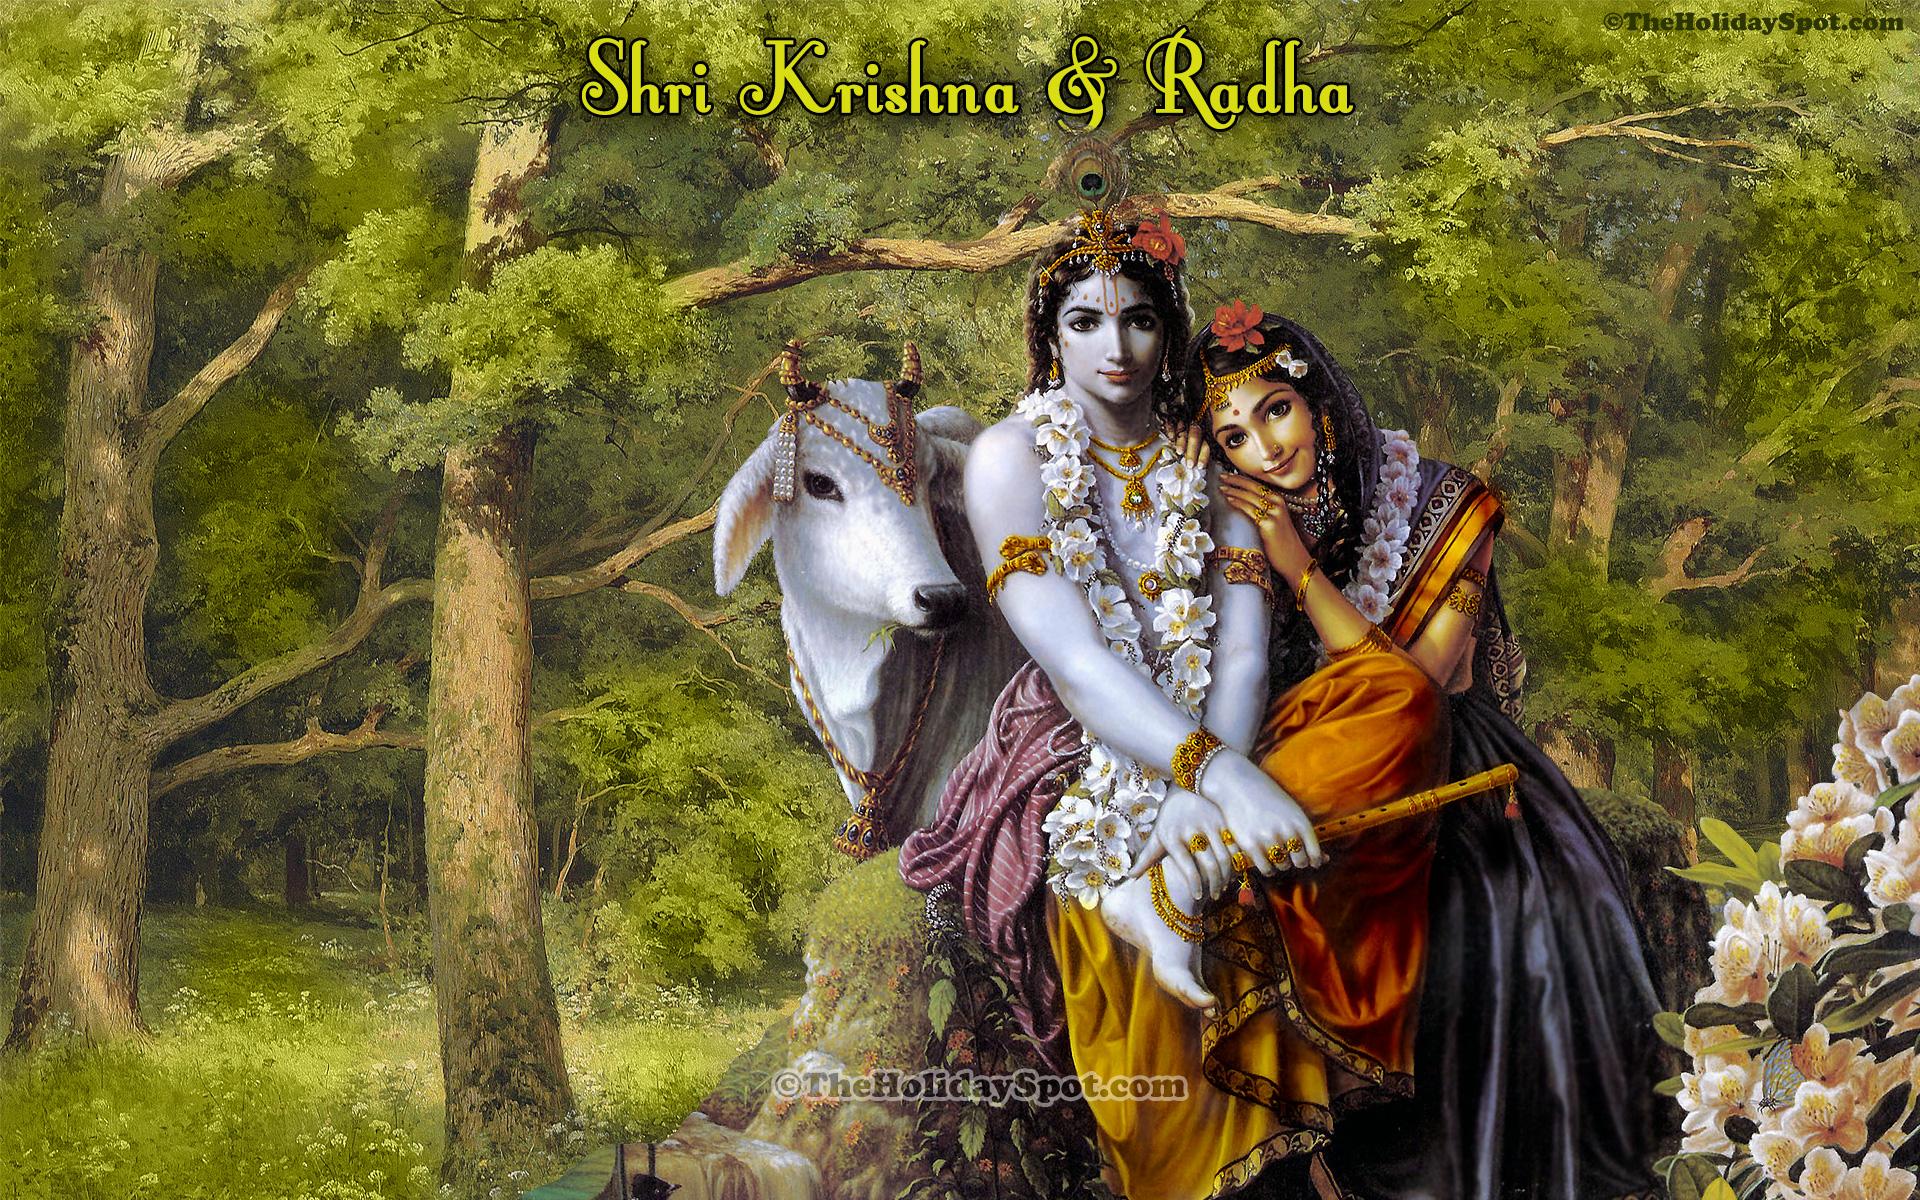 A wonderful high quality illustration of shri krishna and radha